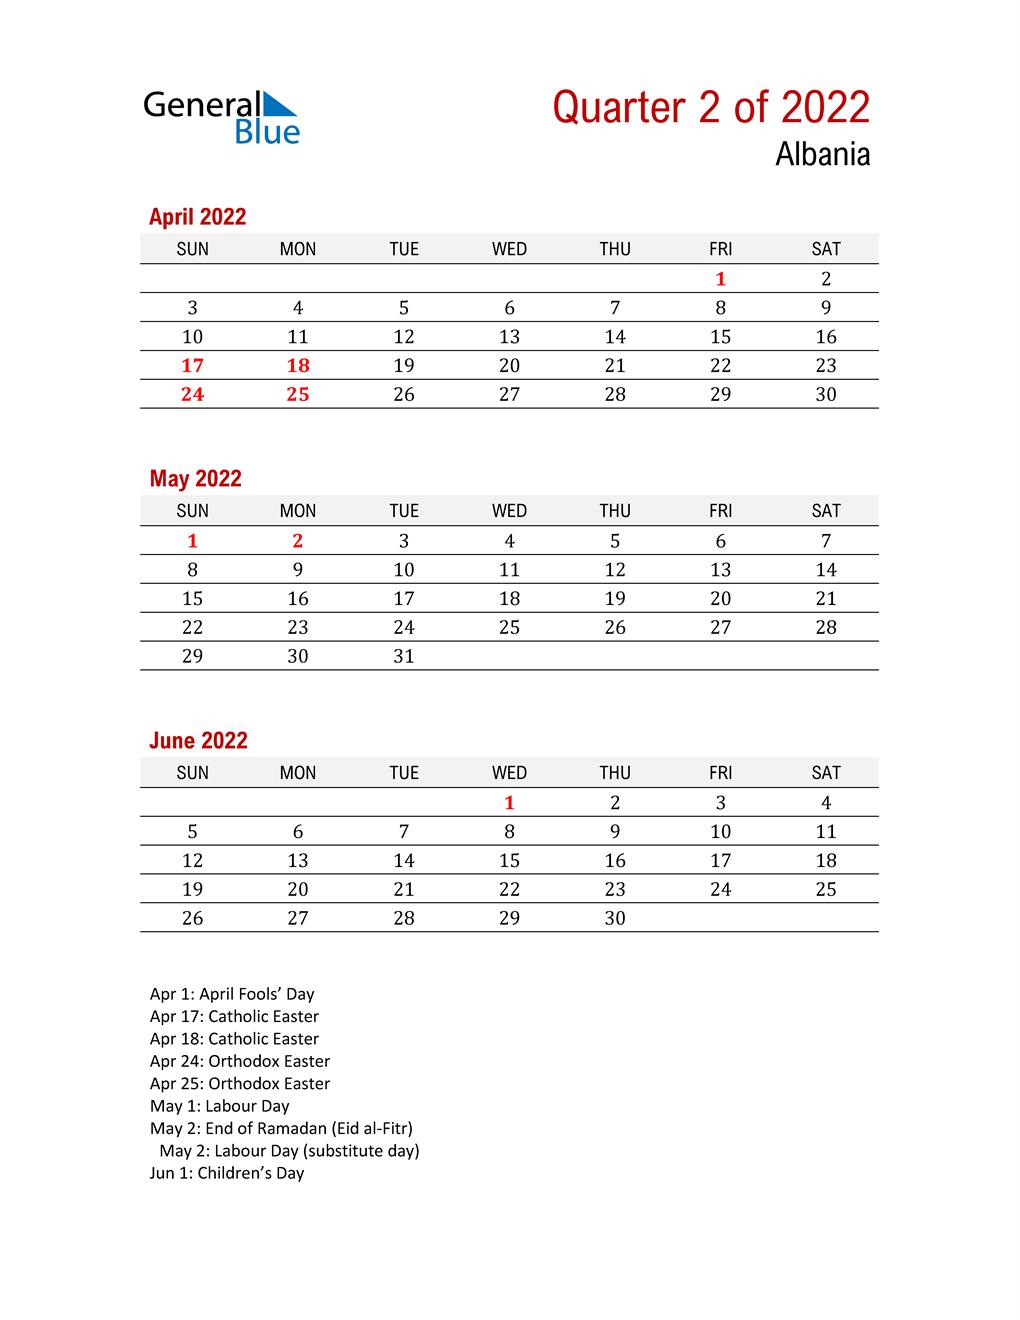 Printable Three Month Calendar for Albania